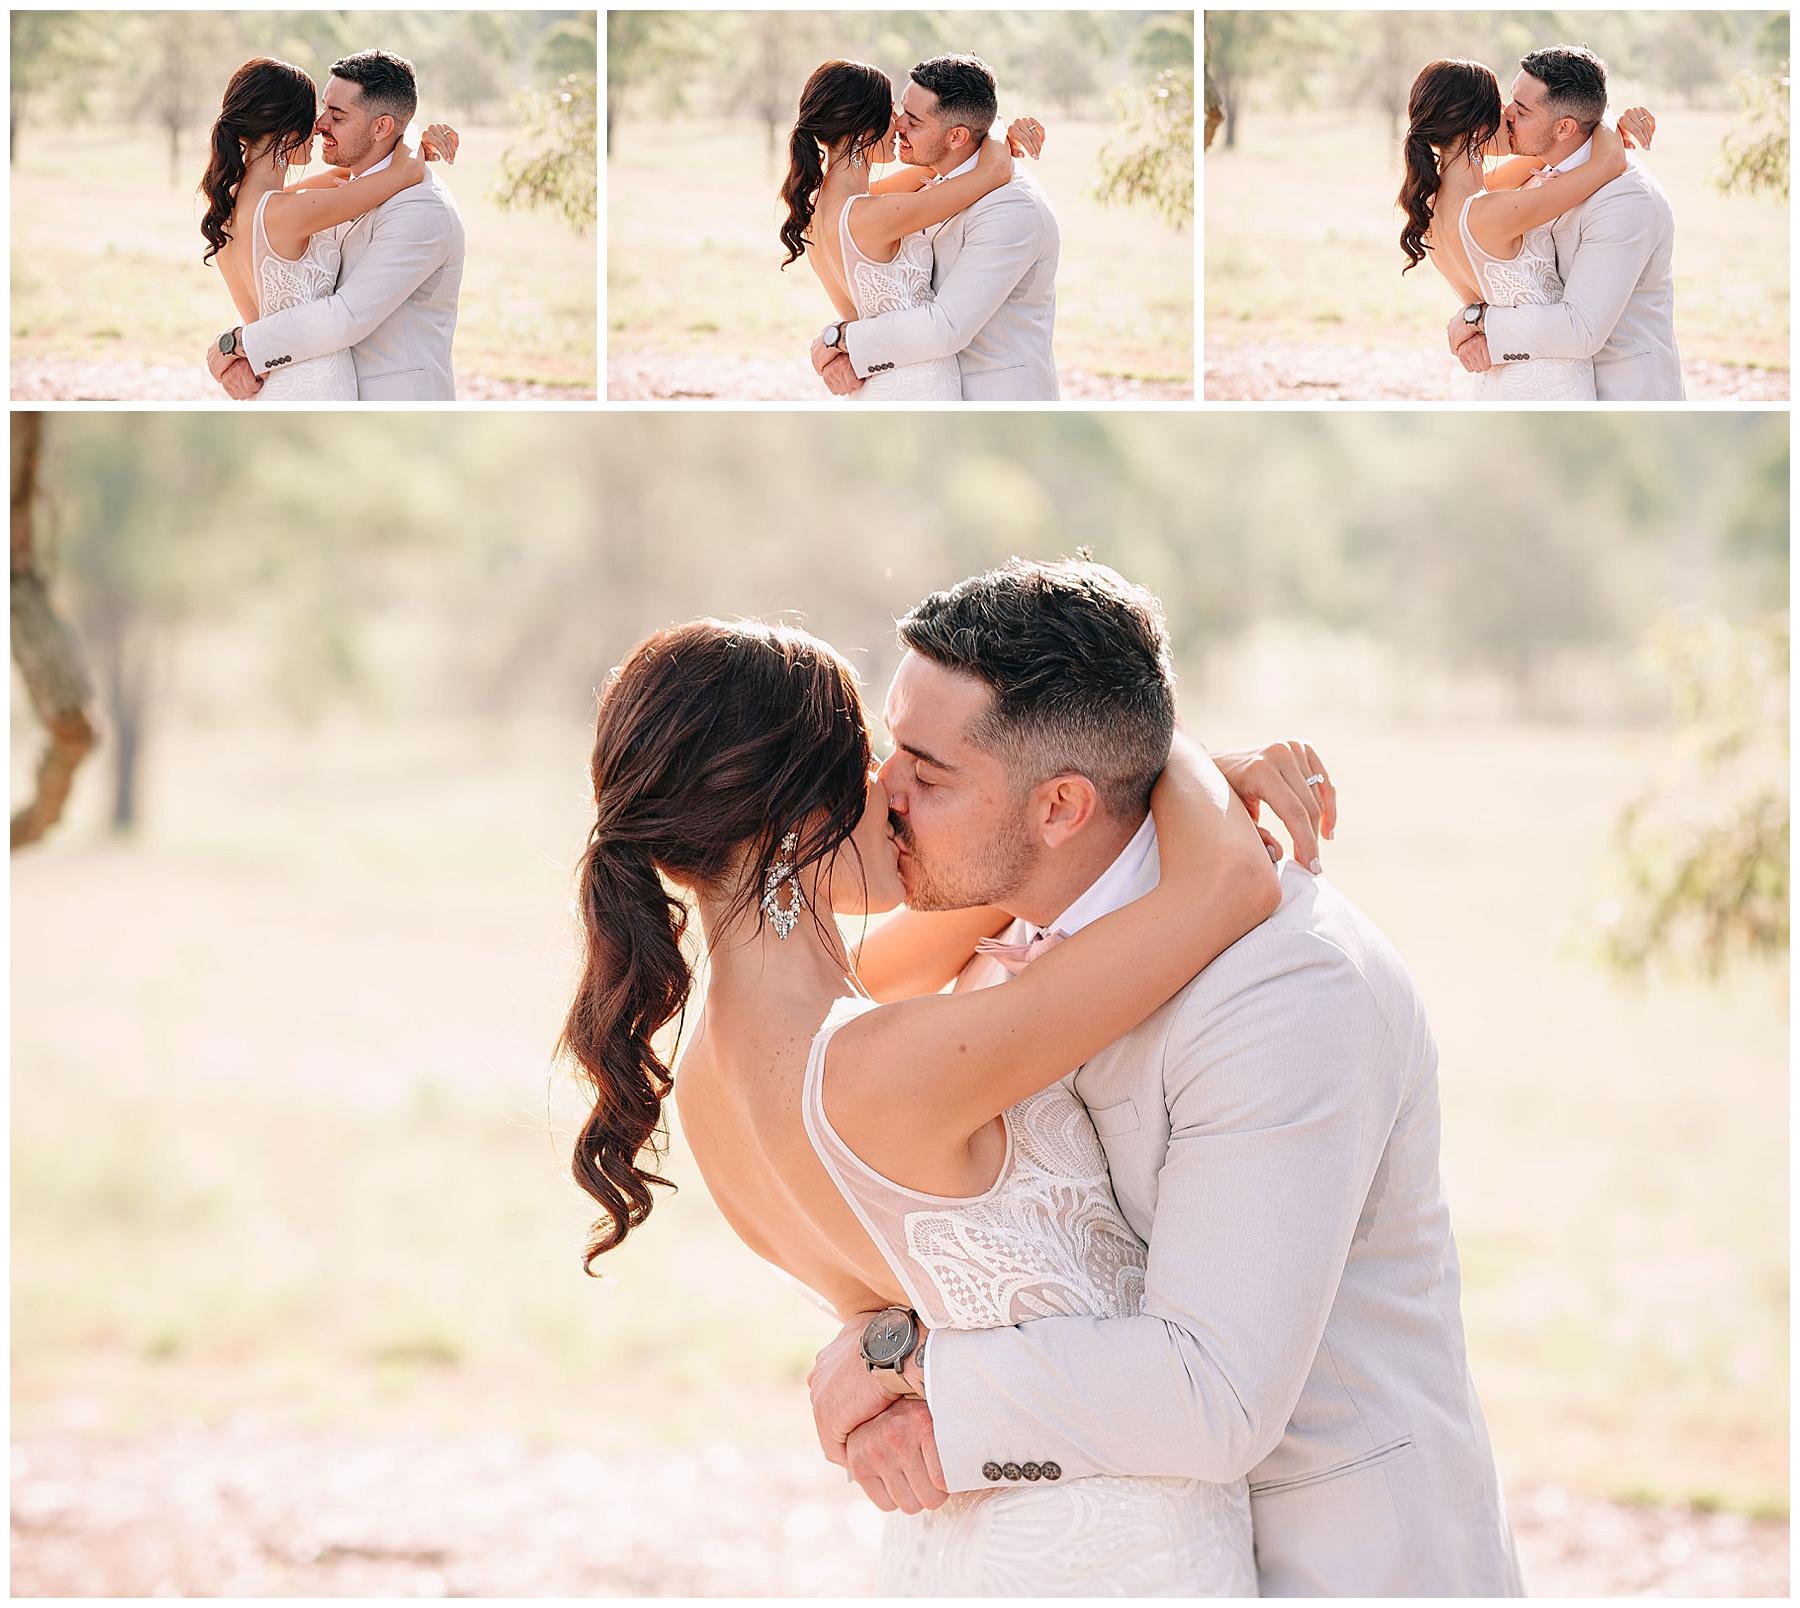 Adam's Peak Wedding Photos + Popcorn Photography_0055.jpg